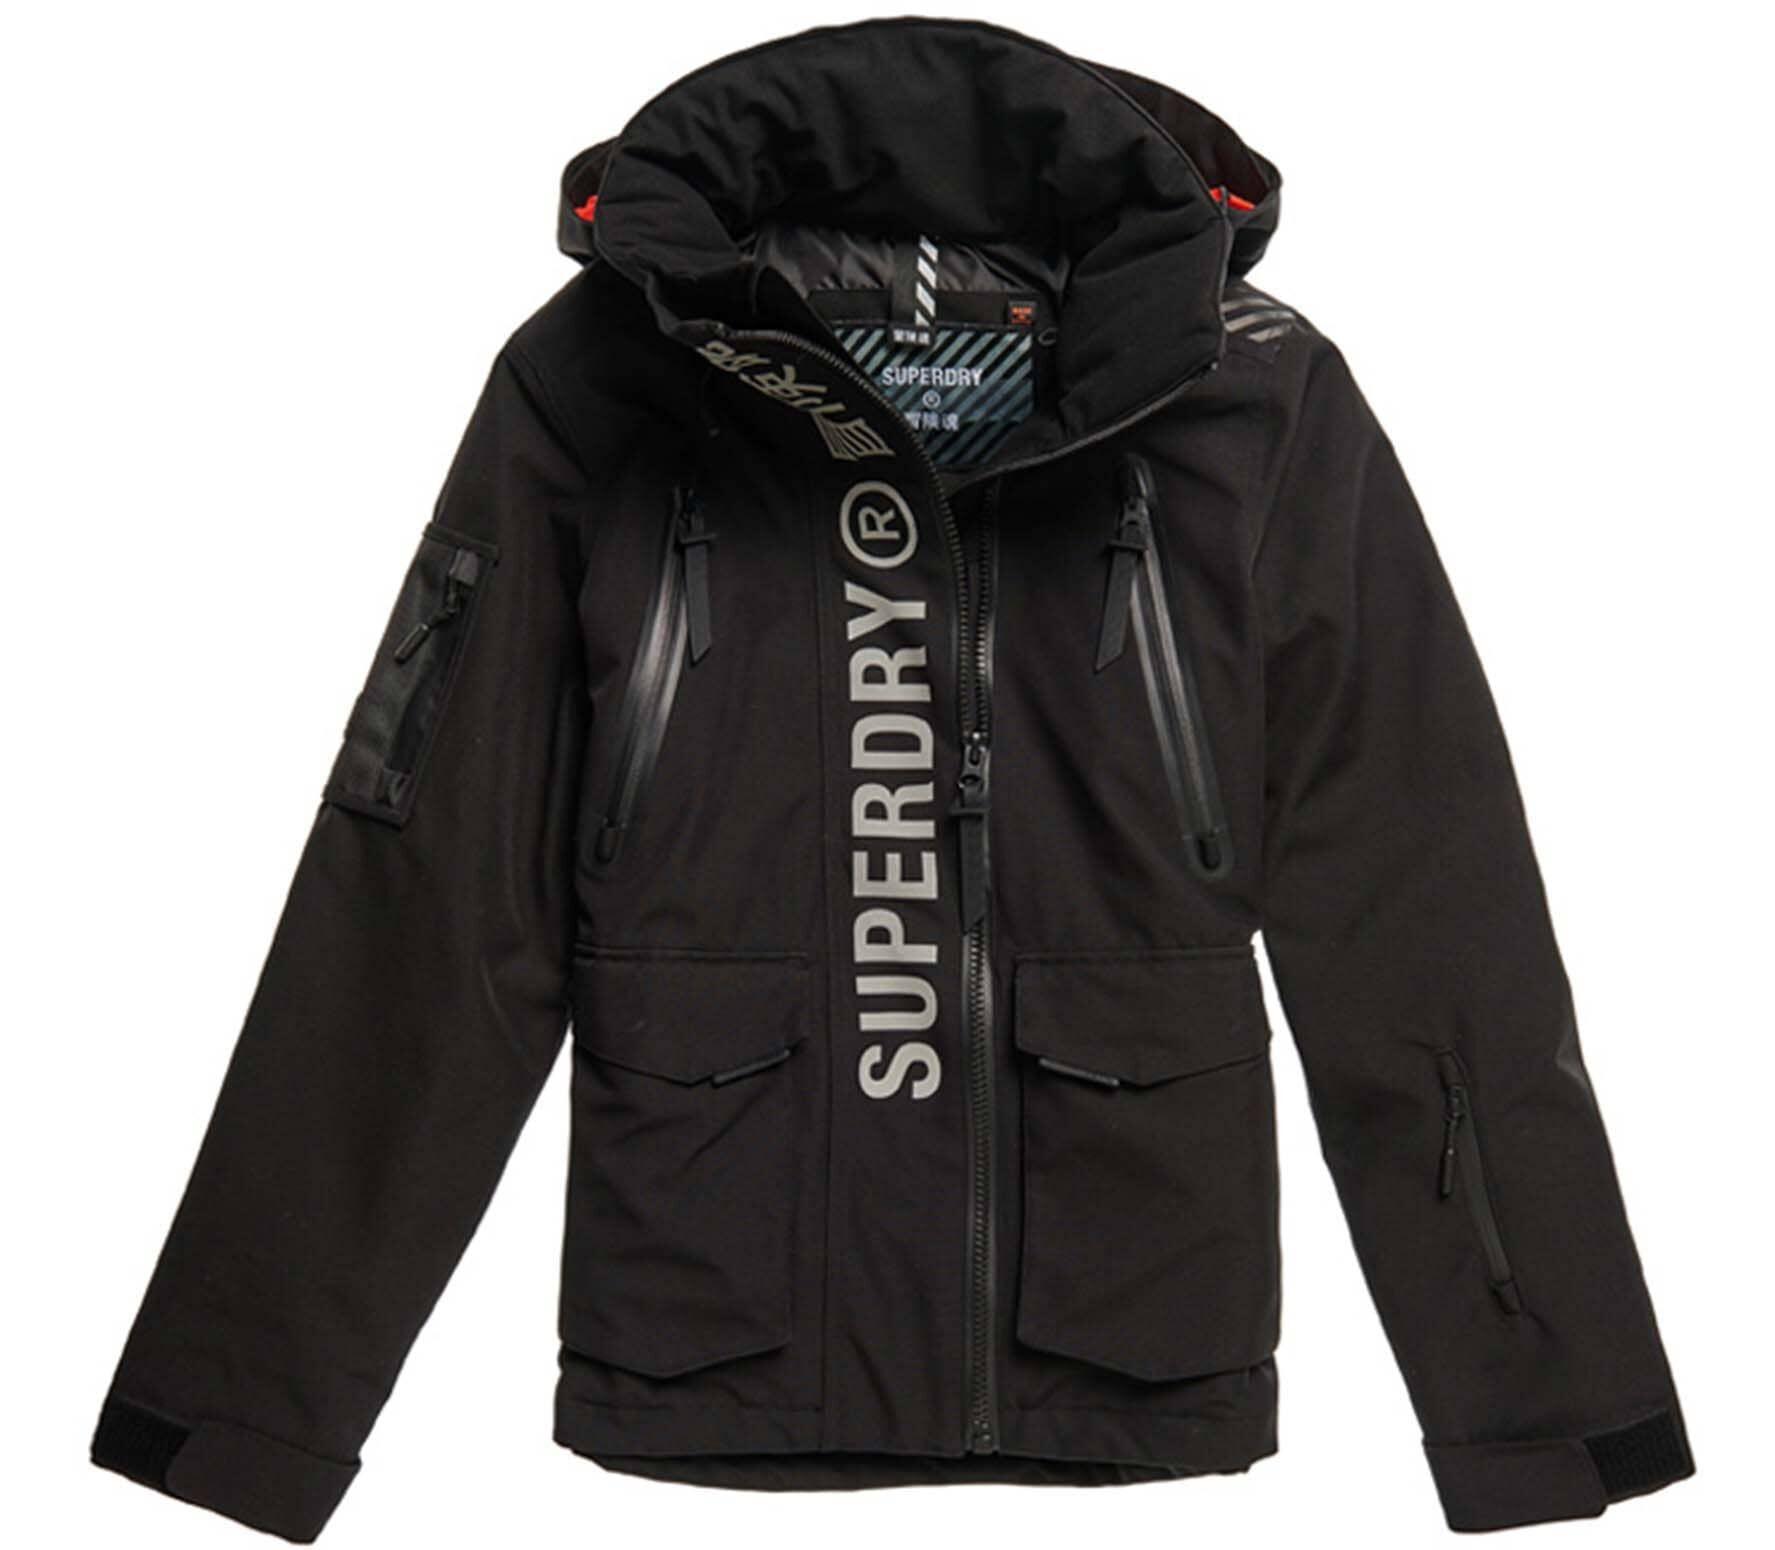 SUPERDRY SPORT® Ultimate Mountain Rescue Herr Skidjacka 50